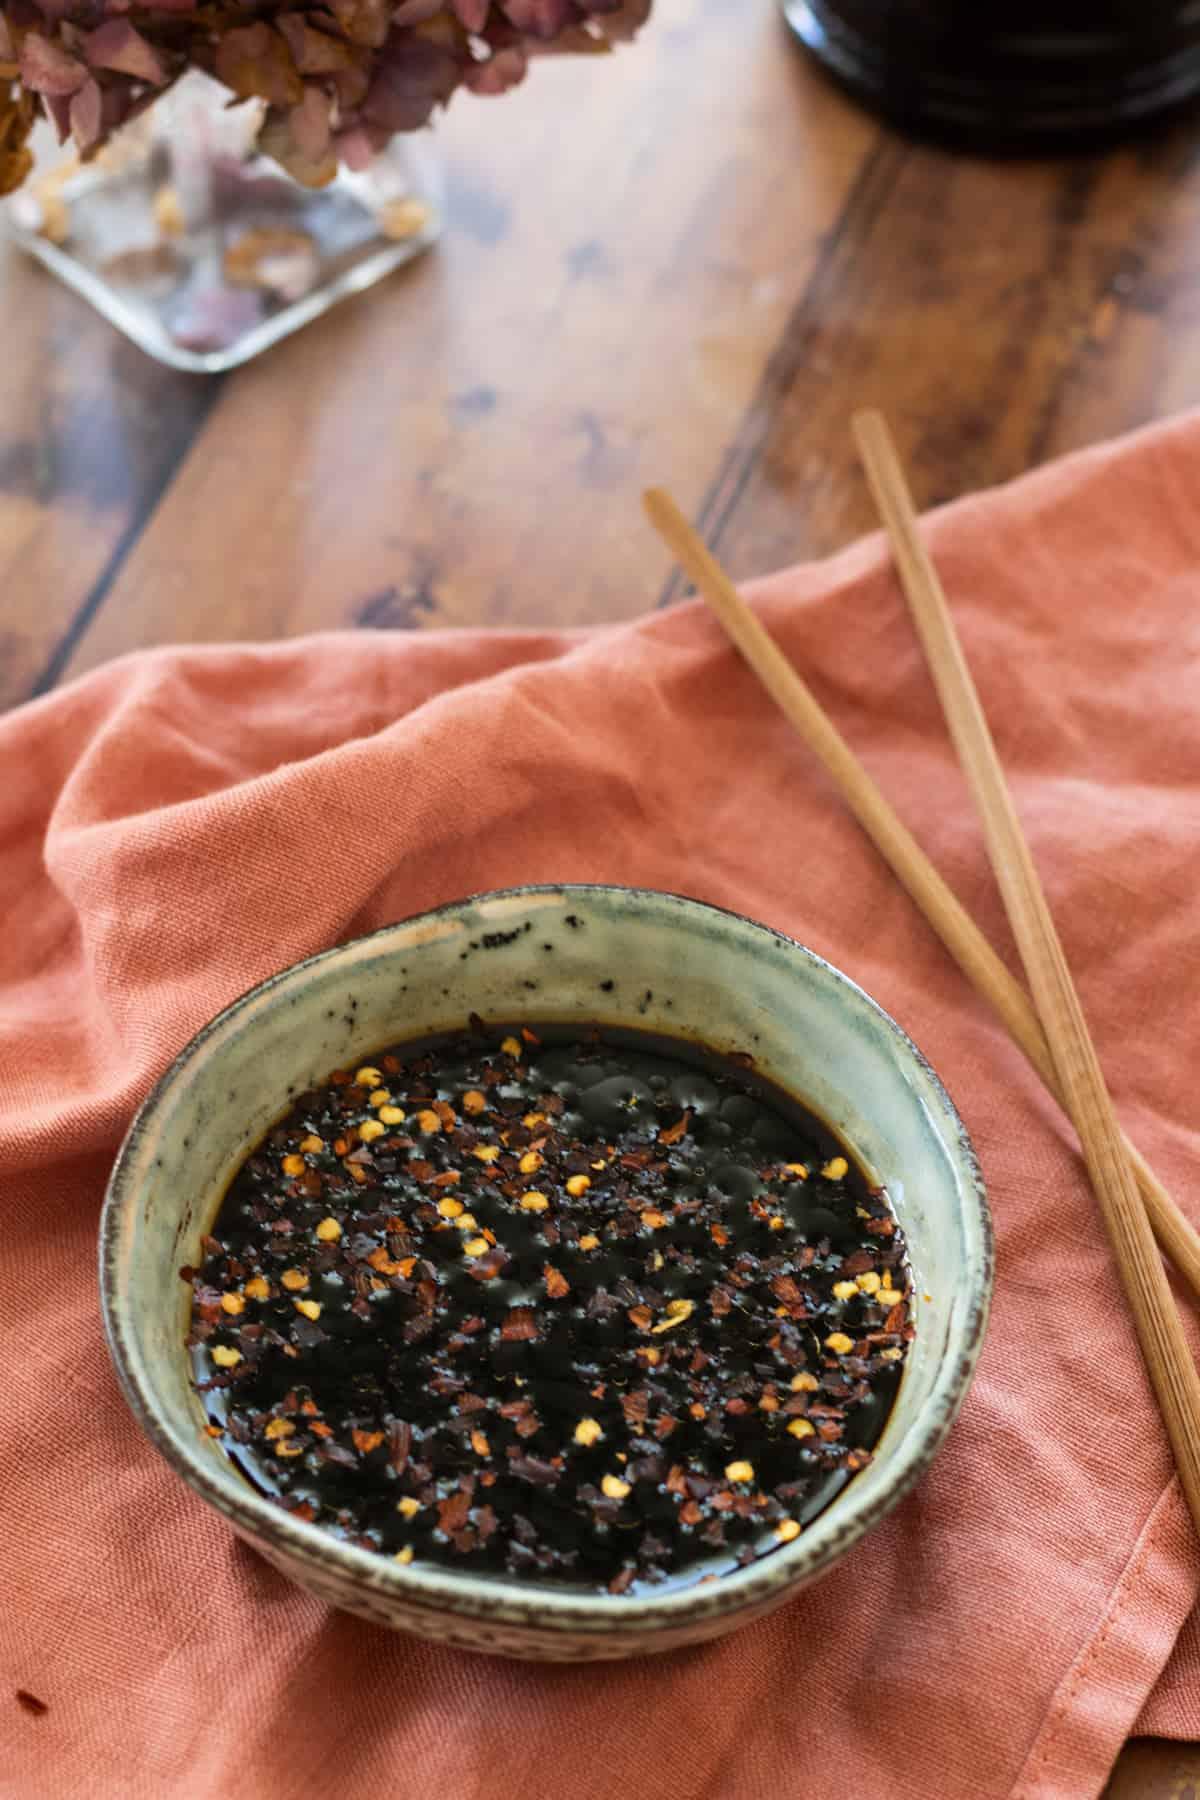 gyoza dipping sauce in a bowl